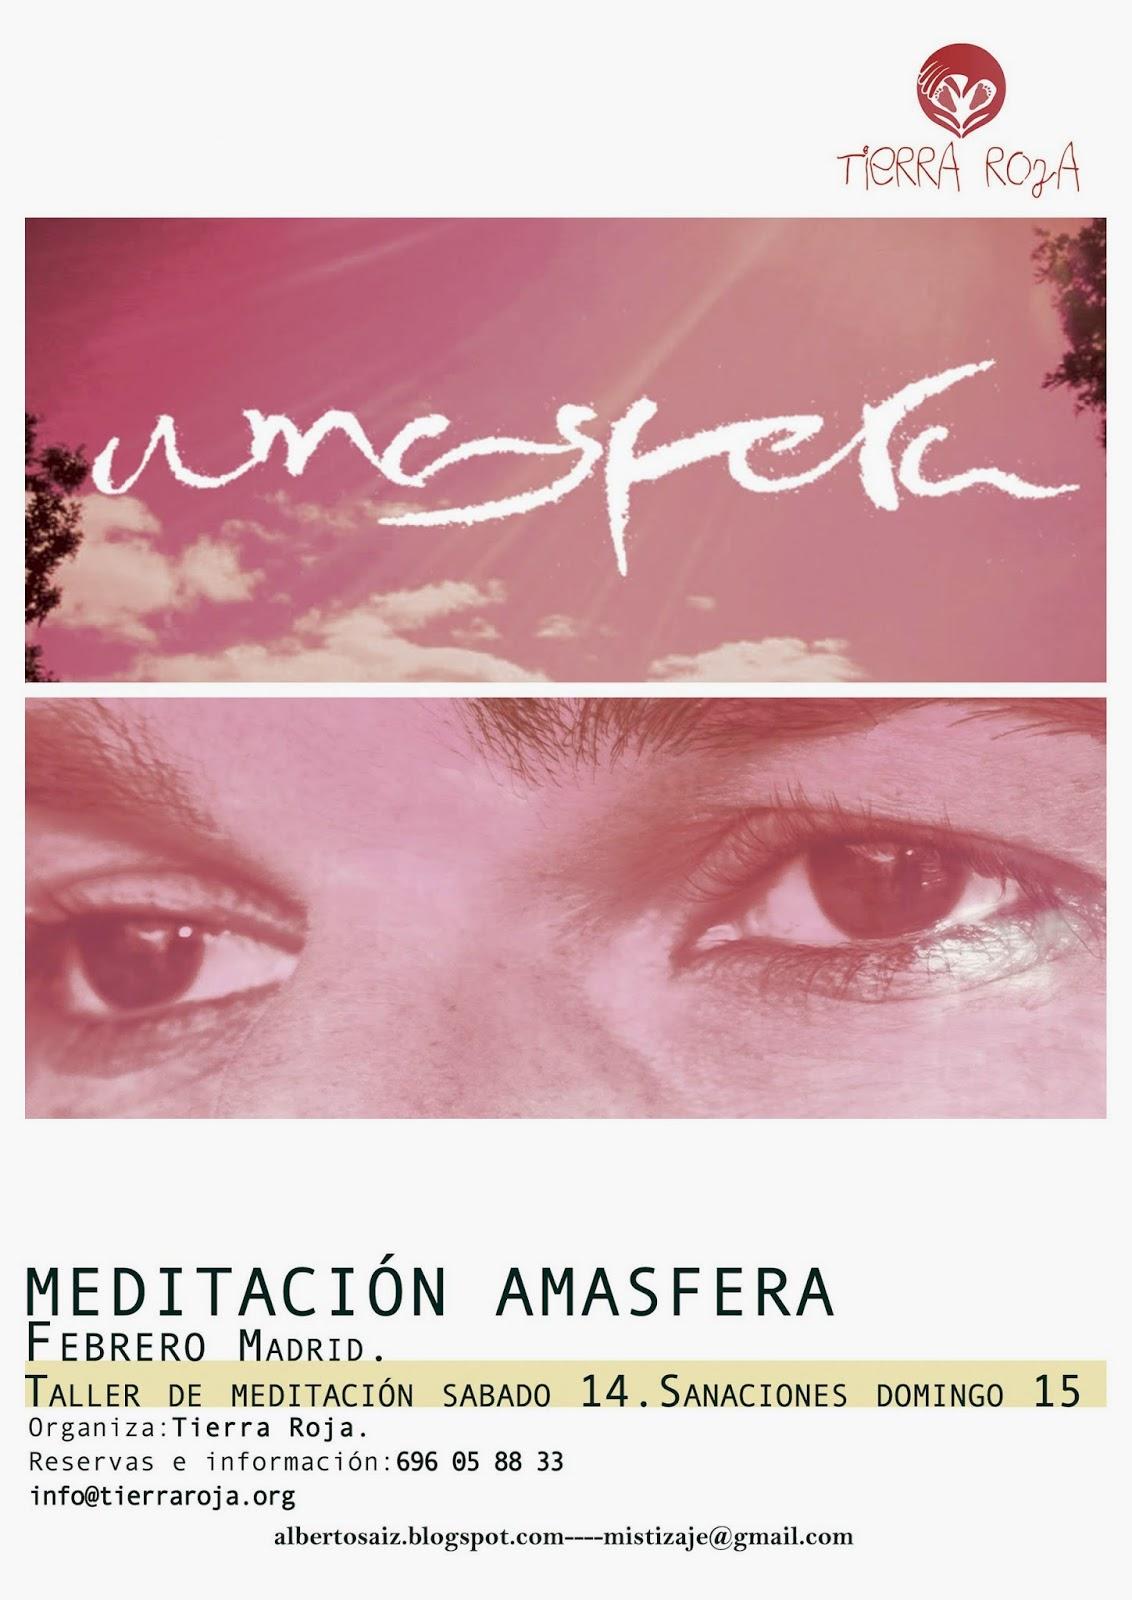 http://www.albertosaiz.blogspot.com.es/p/blog-page_15.html